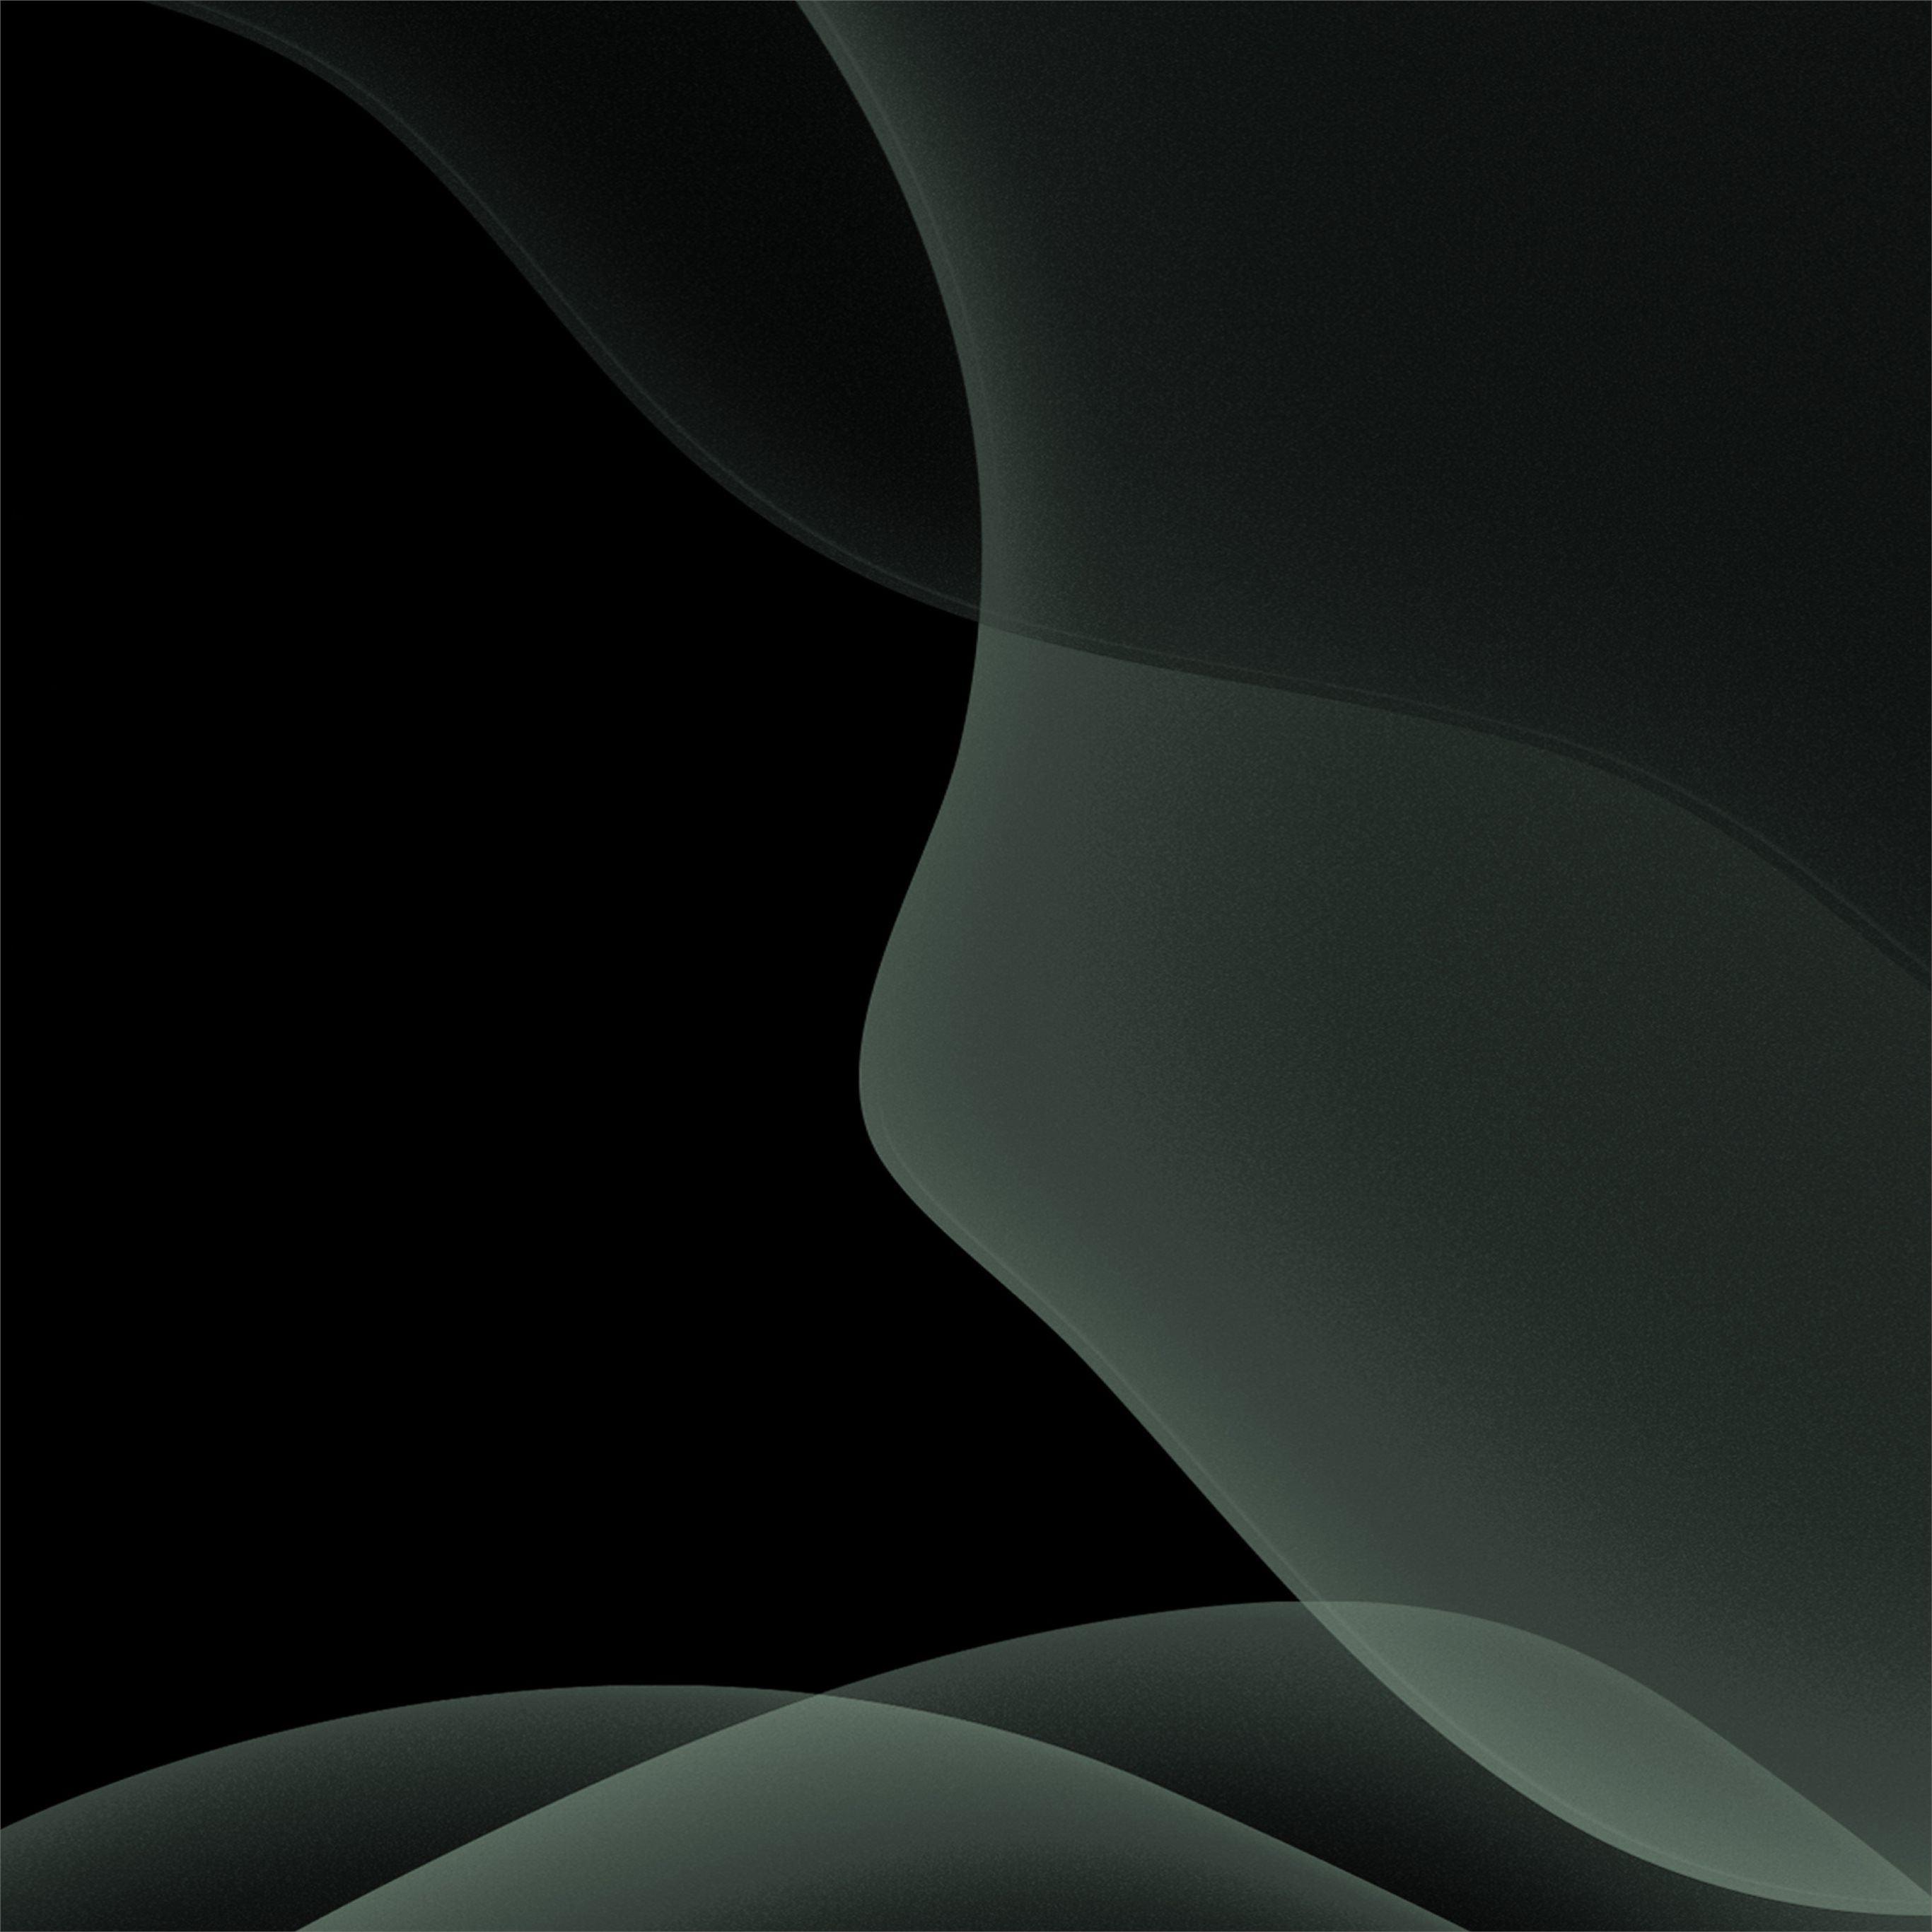 Dark Apple Mac Pro 4k Ipad Pro Wallpapers Free Download